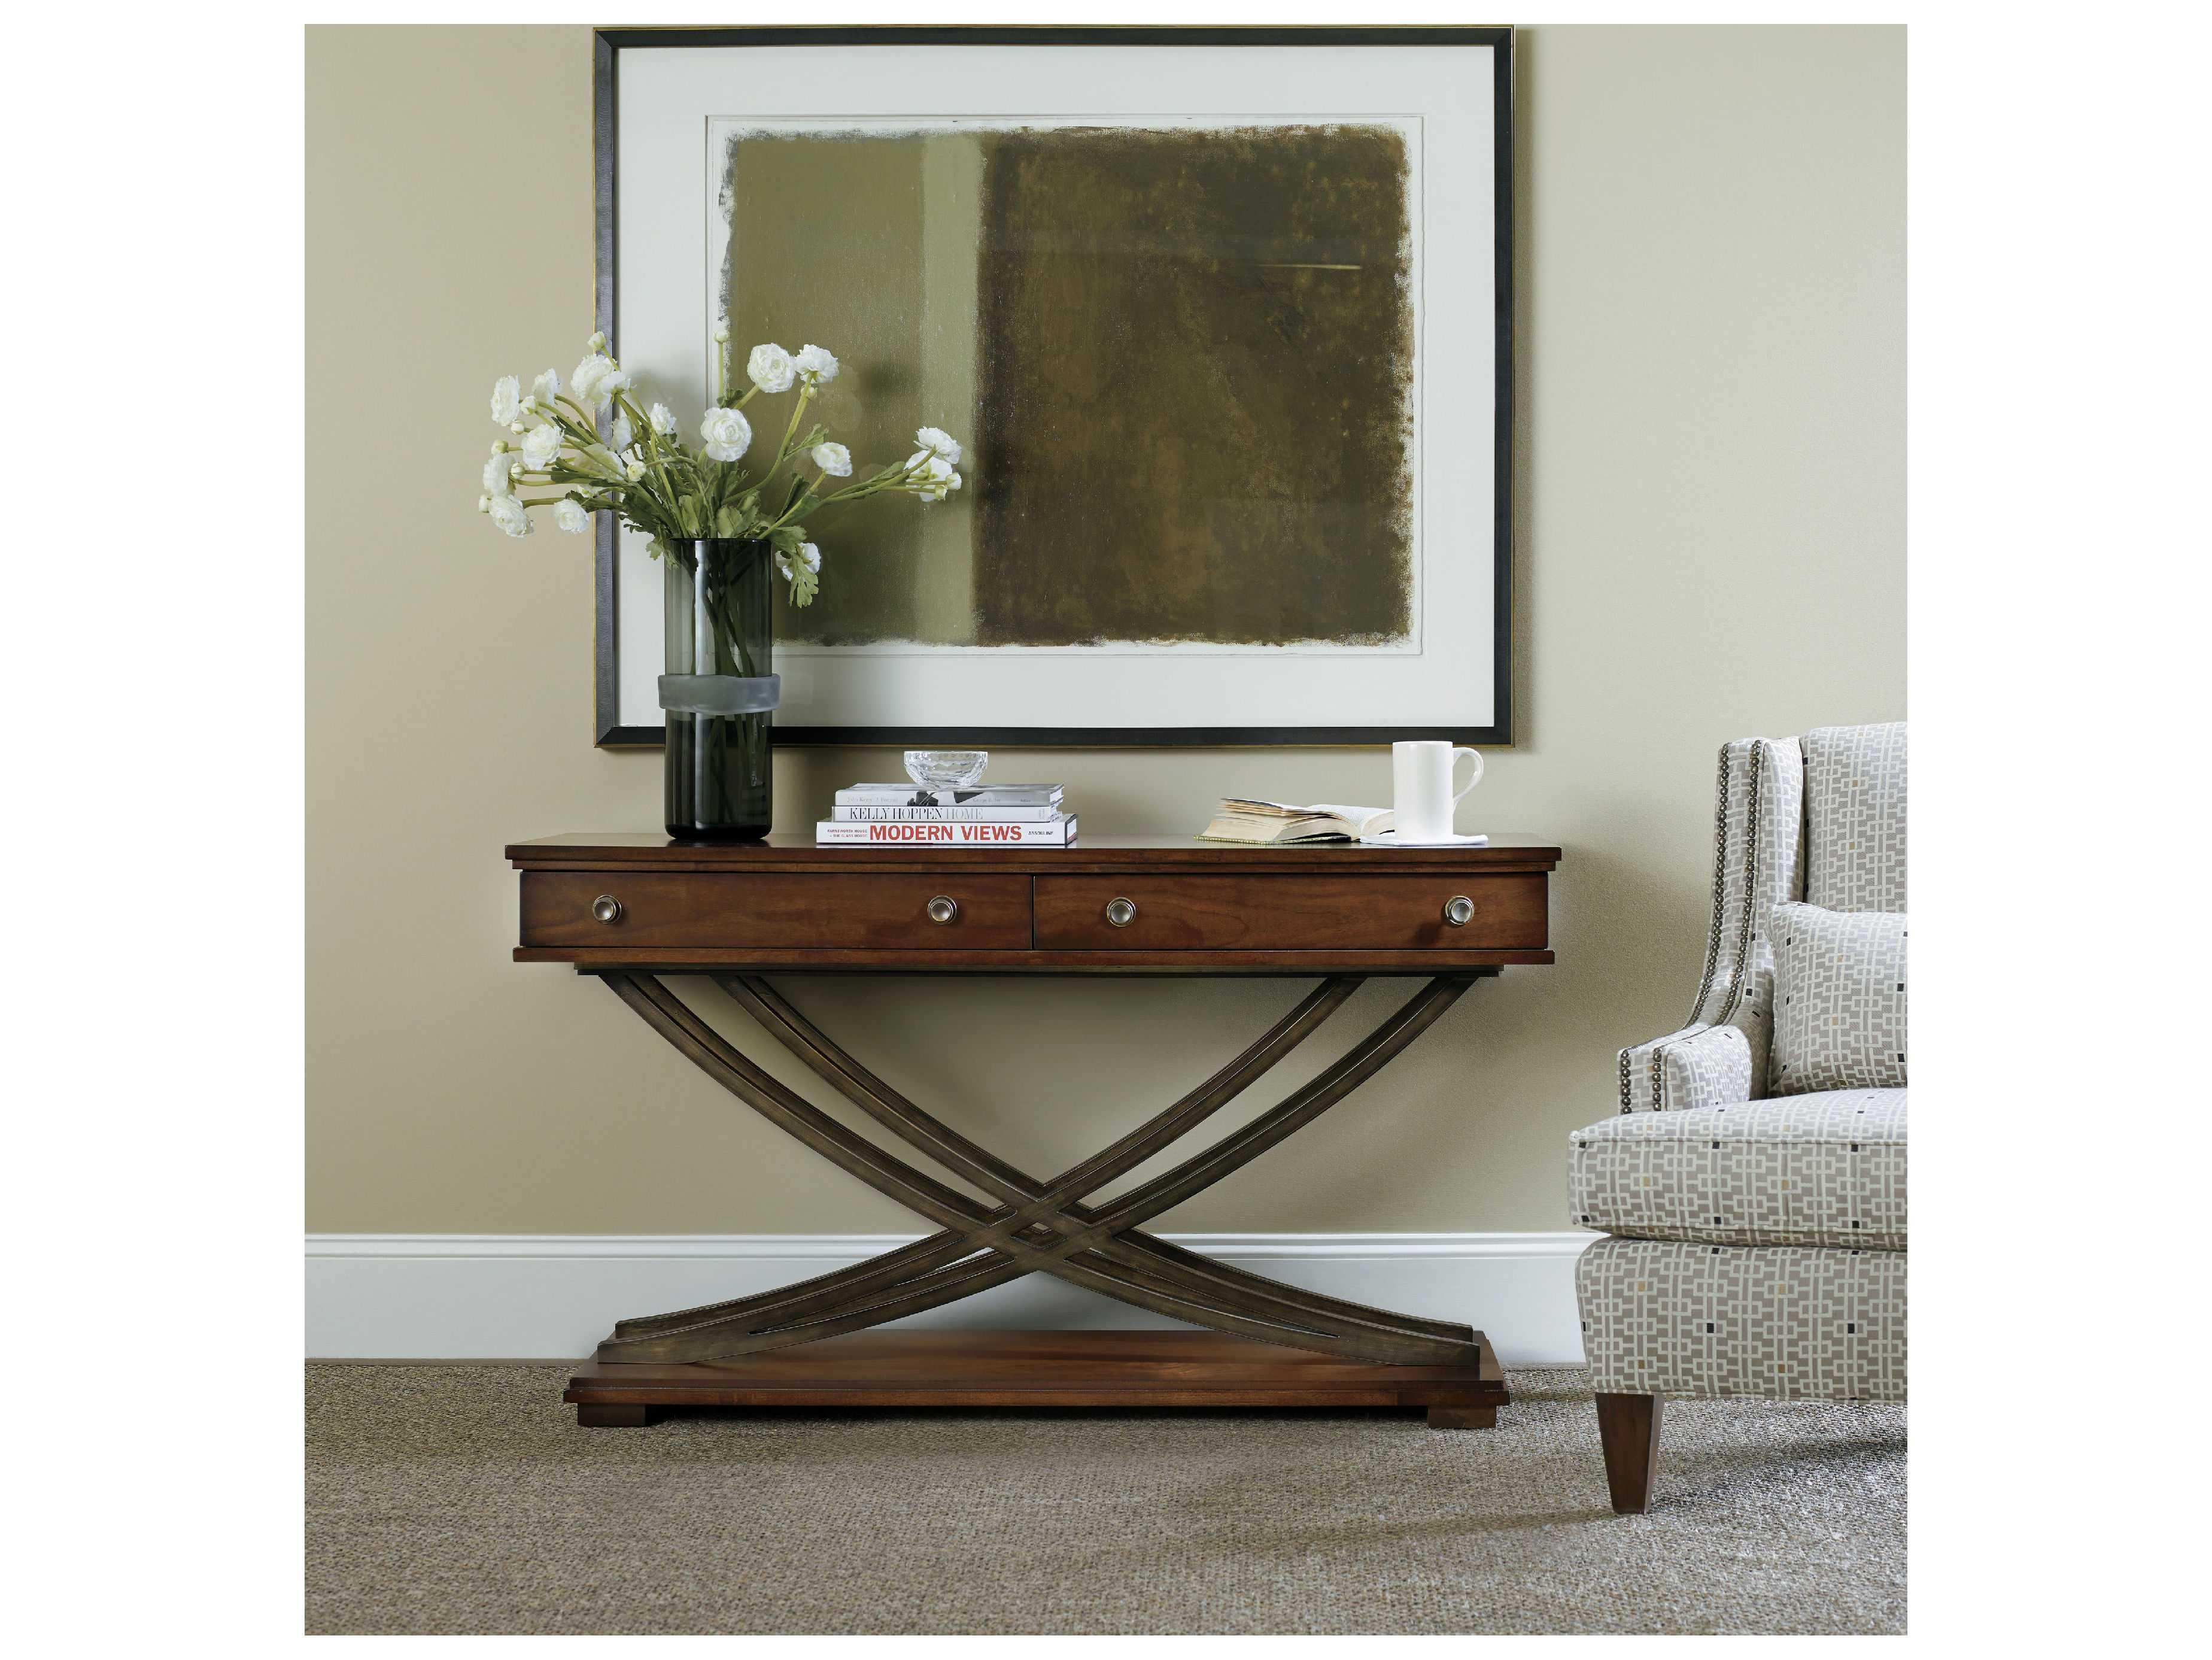 Sensational Luxe Designs 54L X 18 Wide Rectangular Console Table Ibusinesslaw Wood Chair Design Ideas Ibusinesslaworg